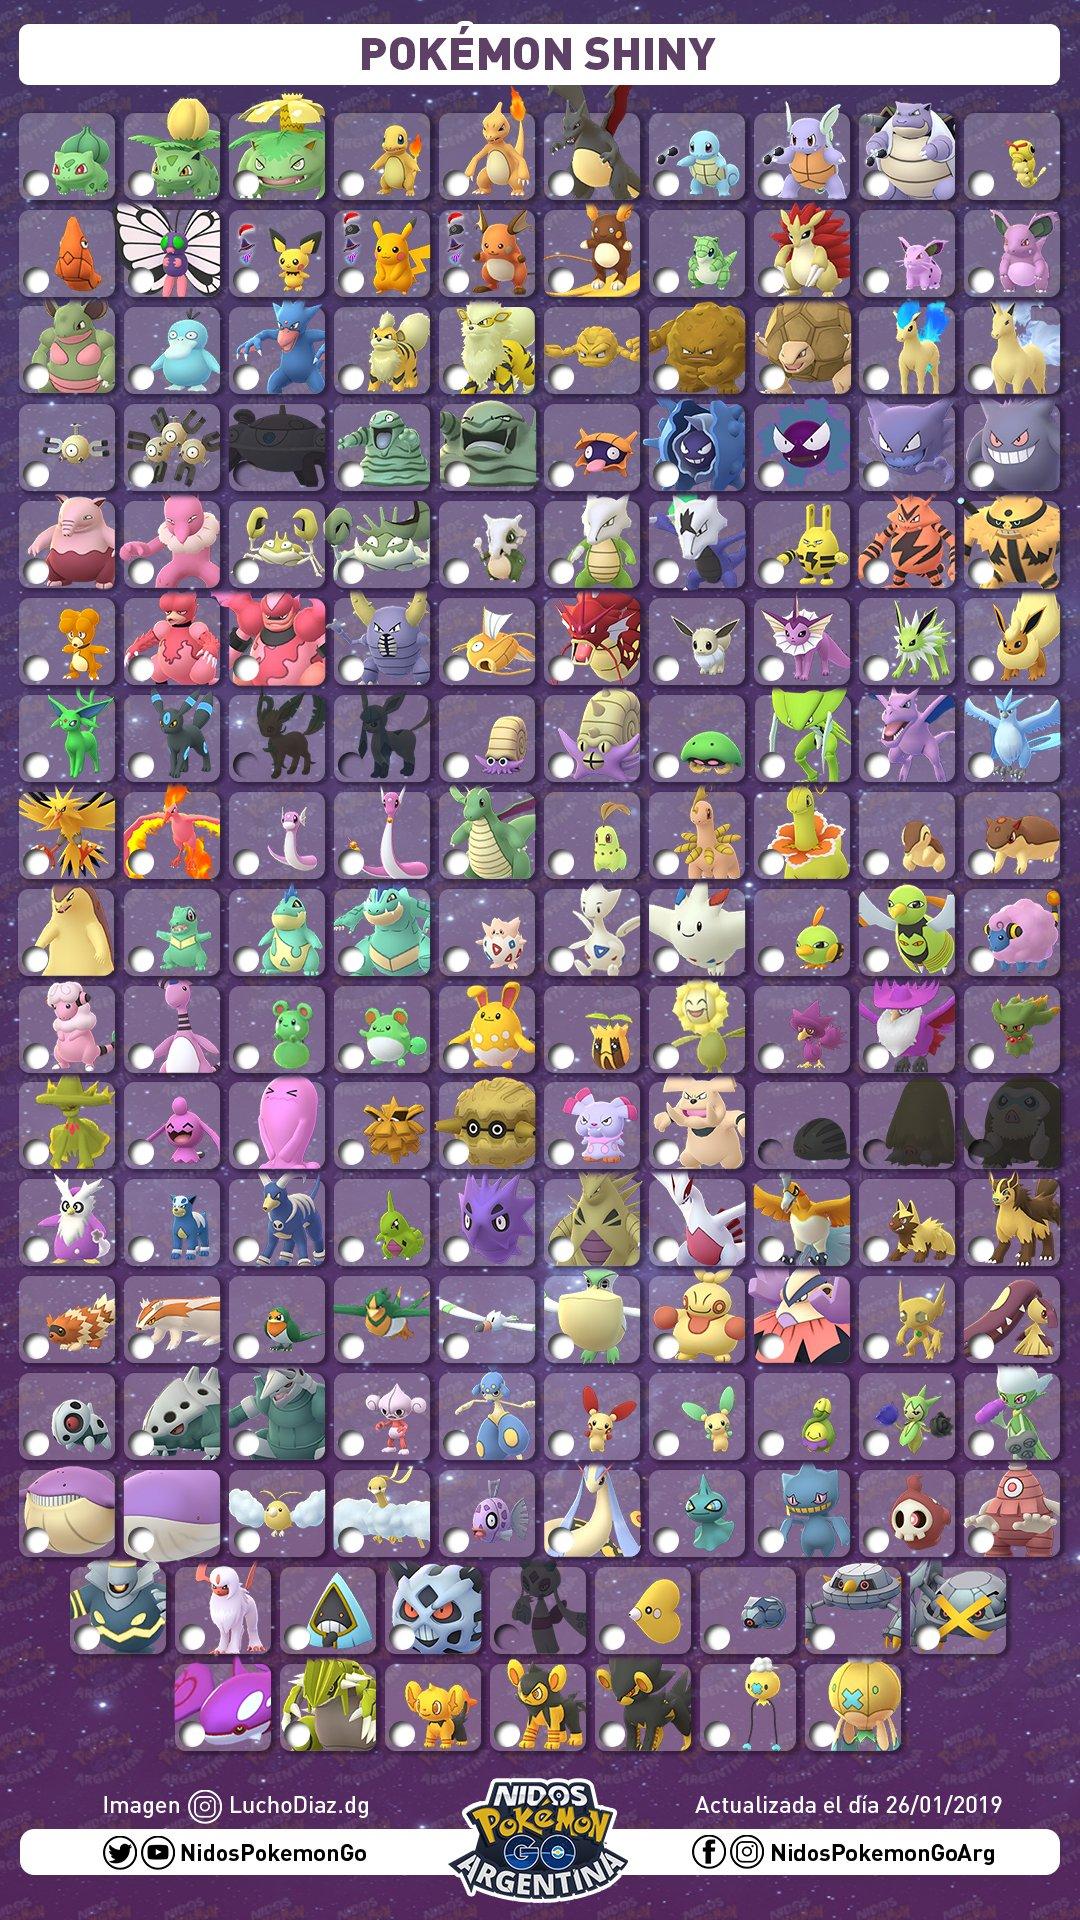 Imagen de Pokémon shiny Enero 2019 hecho por Nidos Pokémon GO Argentina